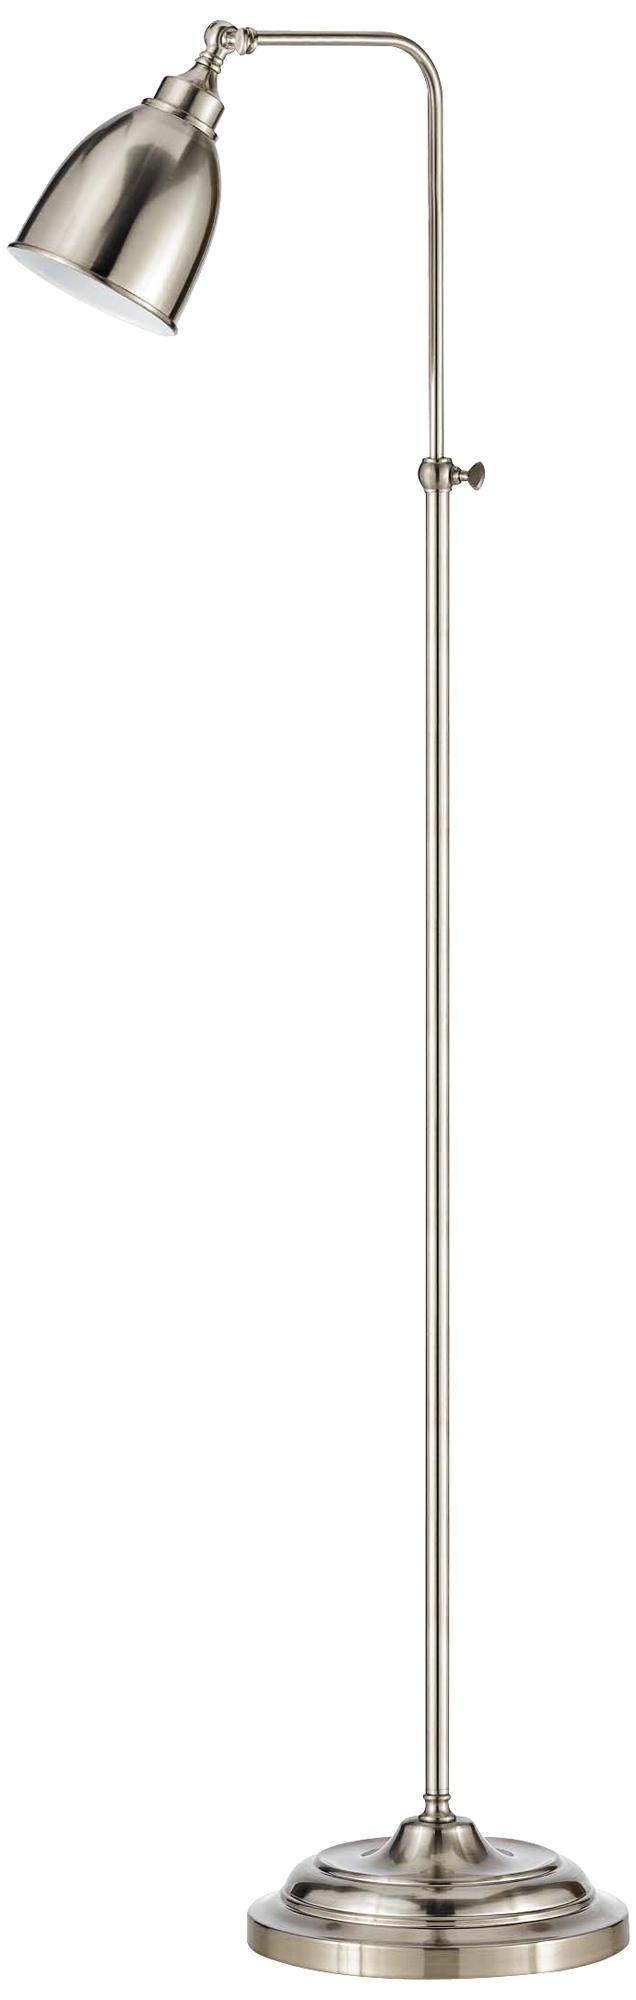 Ikea Redd Schuhregal Kaufen ~ Brushed Steel Metal Adjustable Pole Pharmacy Floor Lamp  Steel Metal